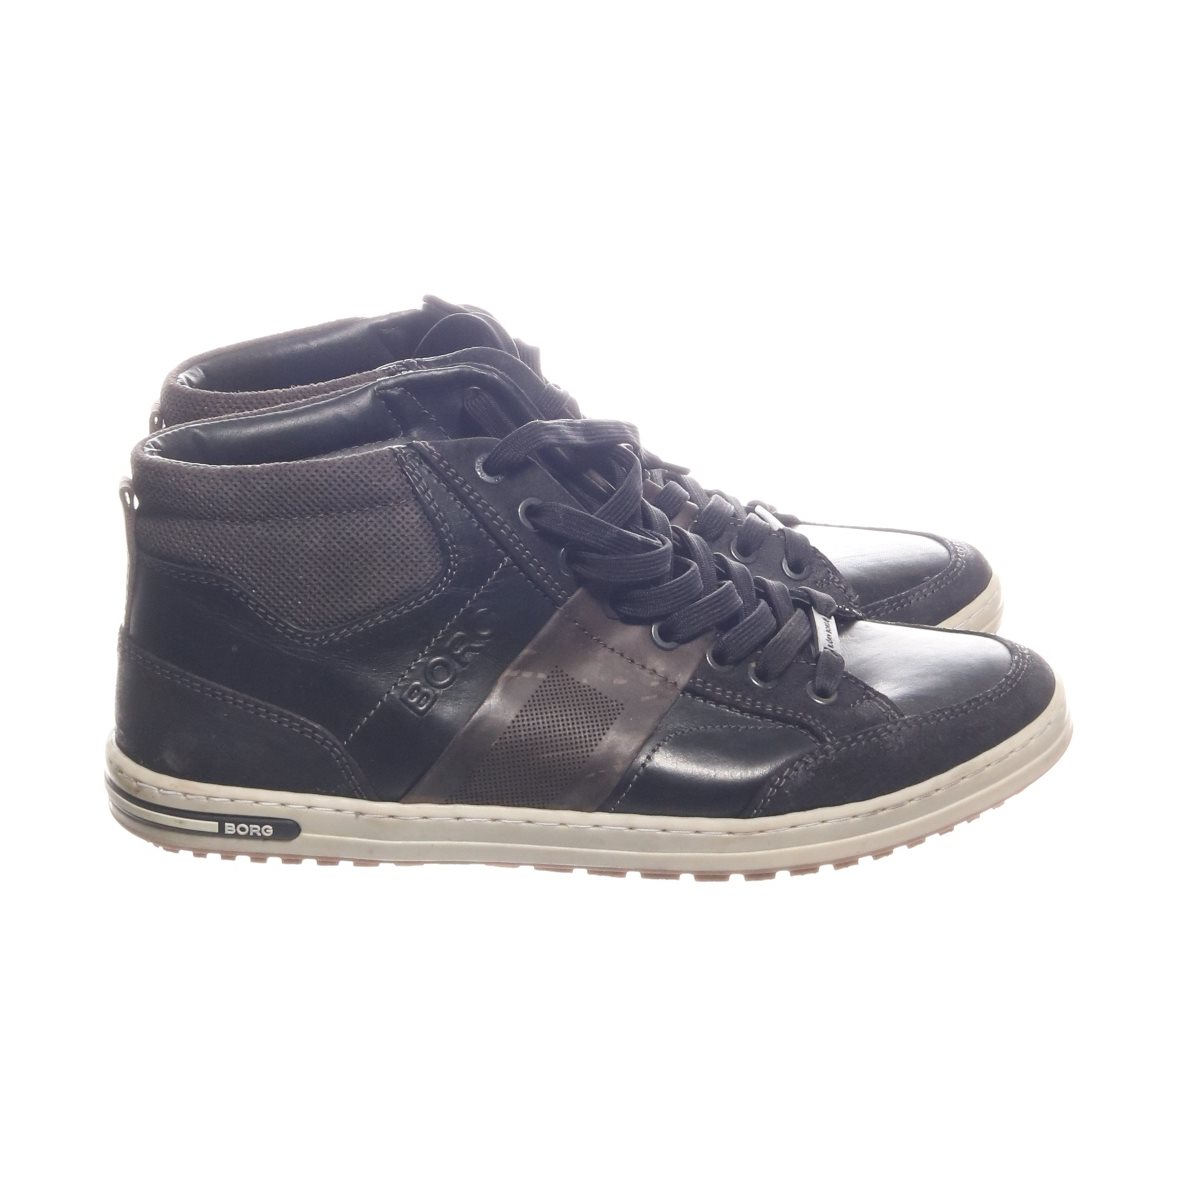 svarta skinn sneakers